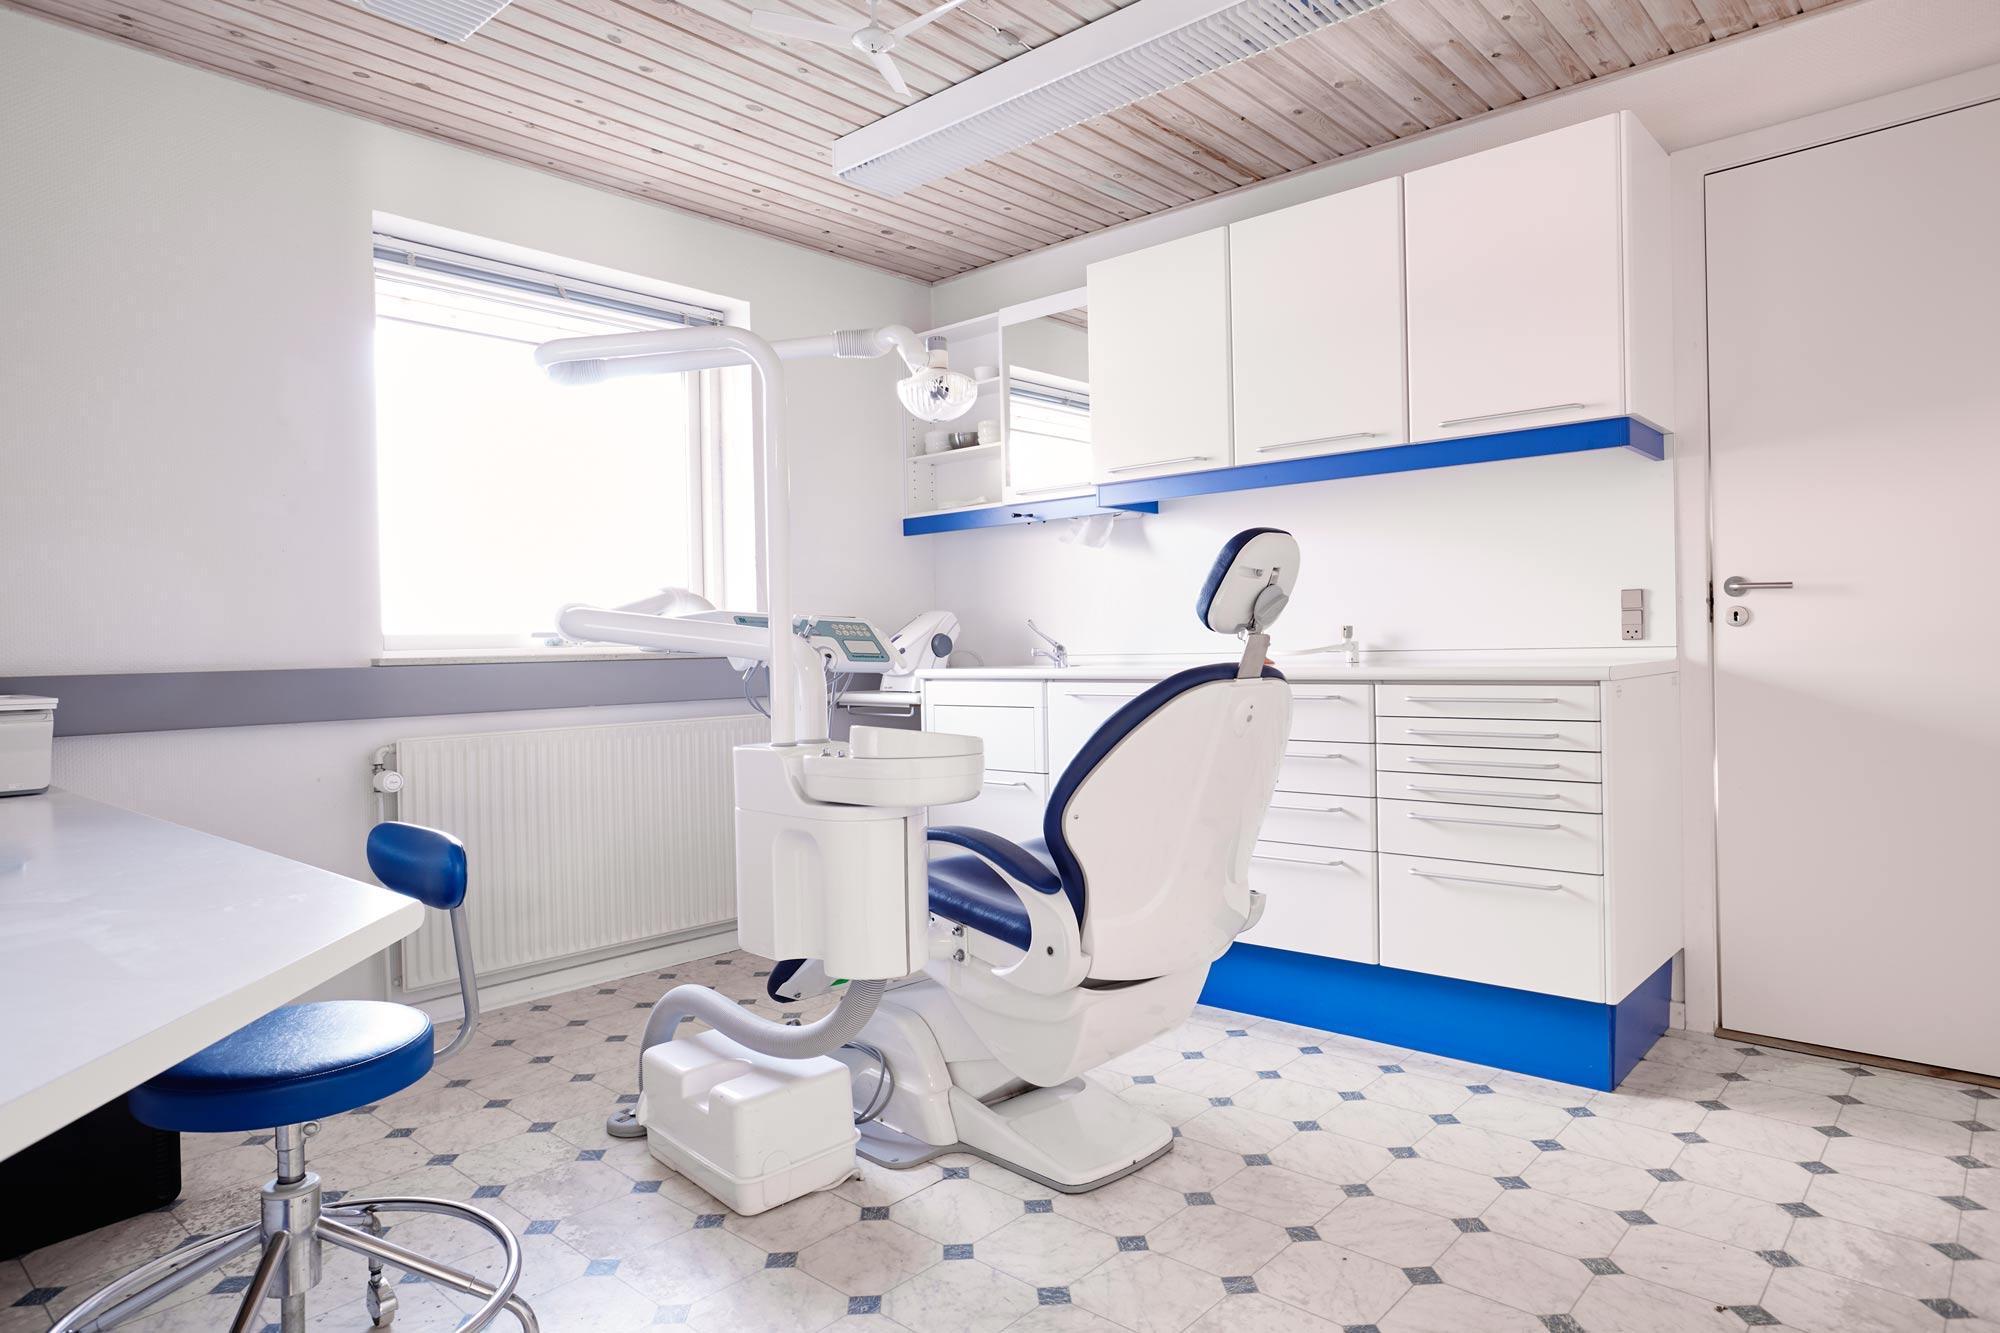 Hobro klinikken